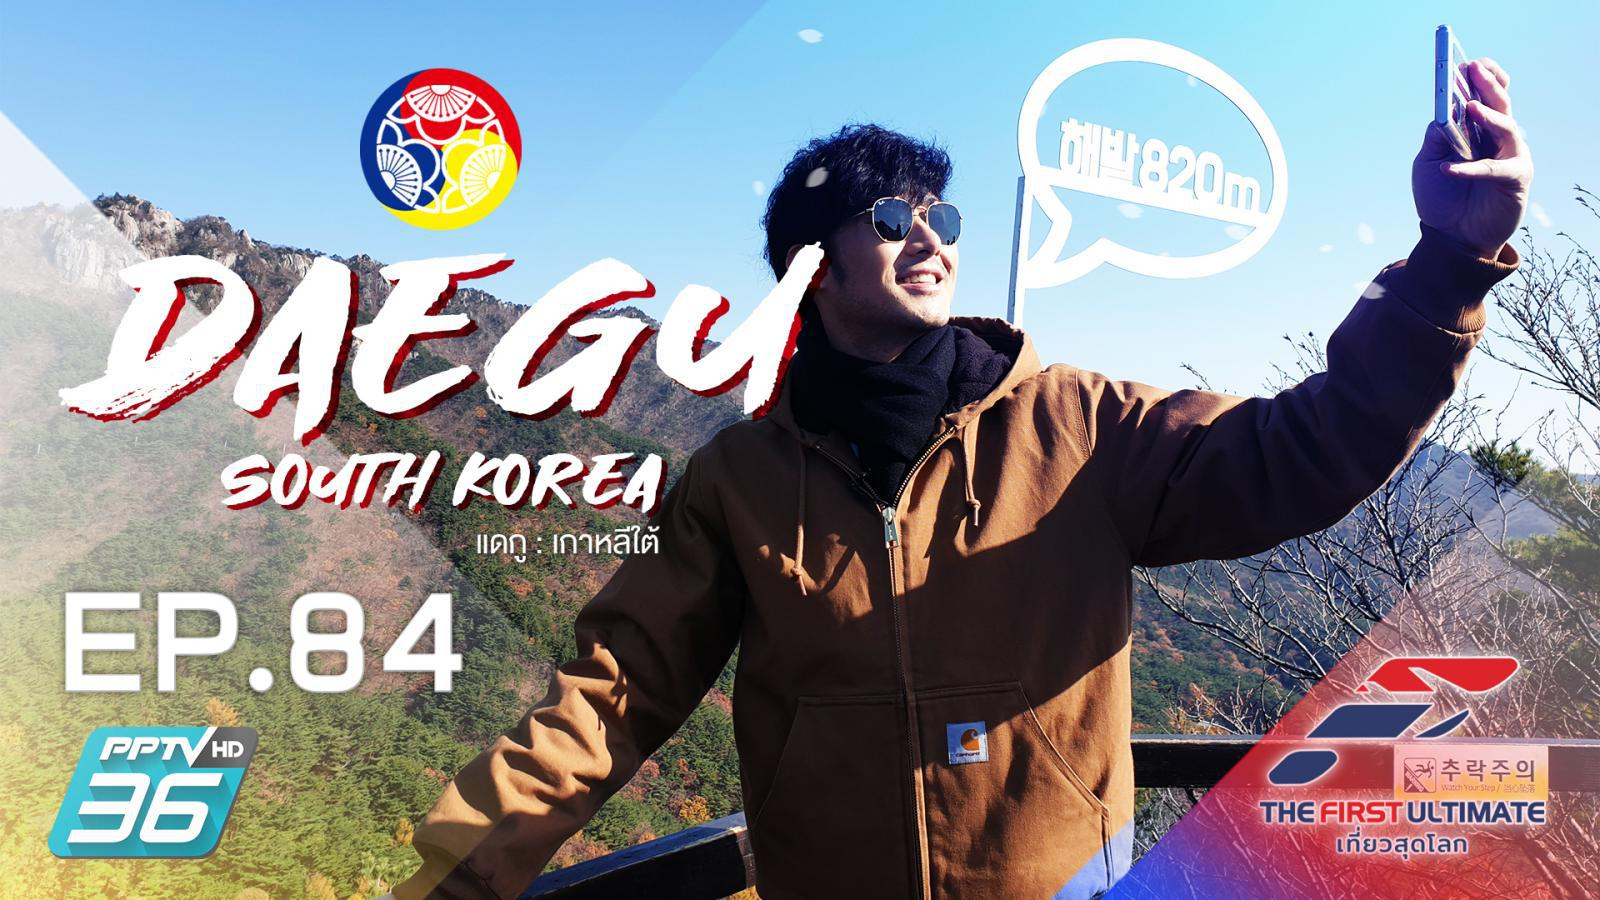 South Korea-Daegu ตอนที่ 4